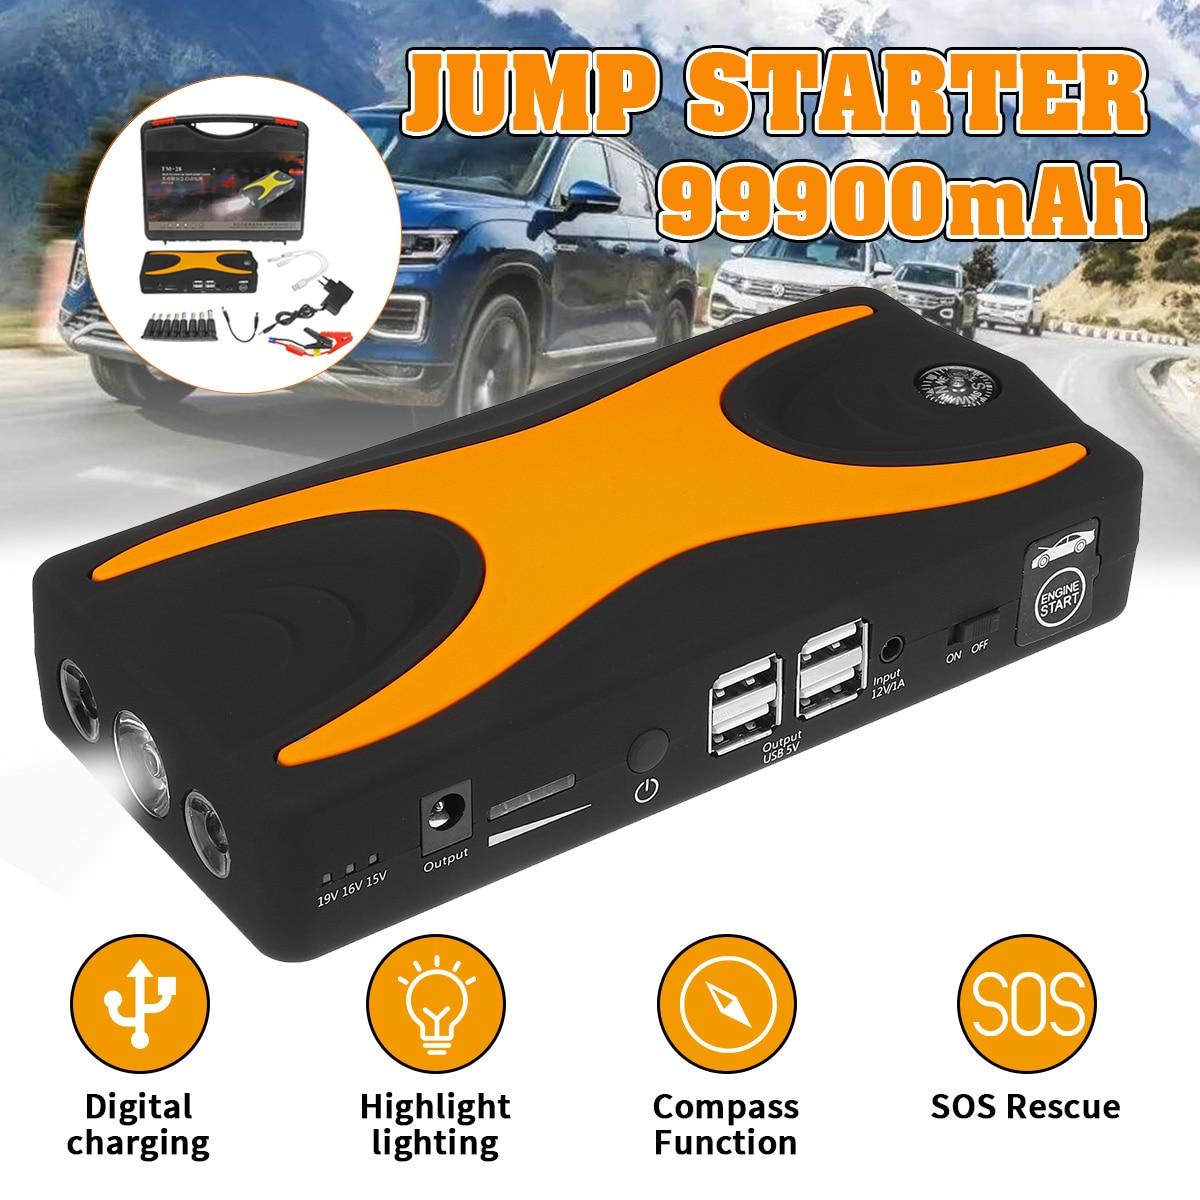 Carro ir para iniciantes 99900 mah 15 v 4usb 900a carregador de impulsionador de bateria de carro portátil banco de potência de emergência dispositivo partida